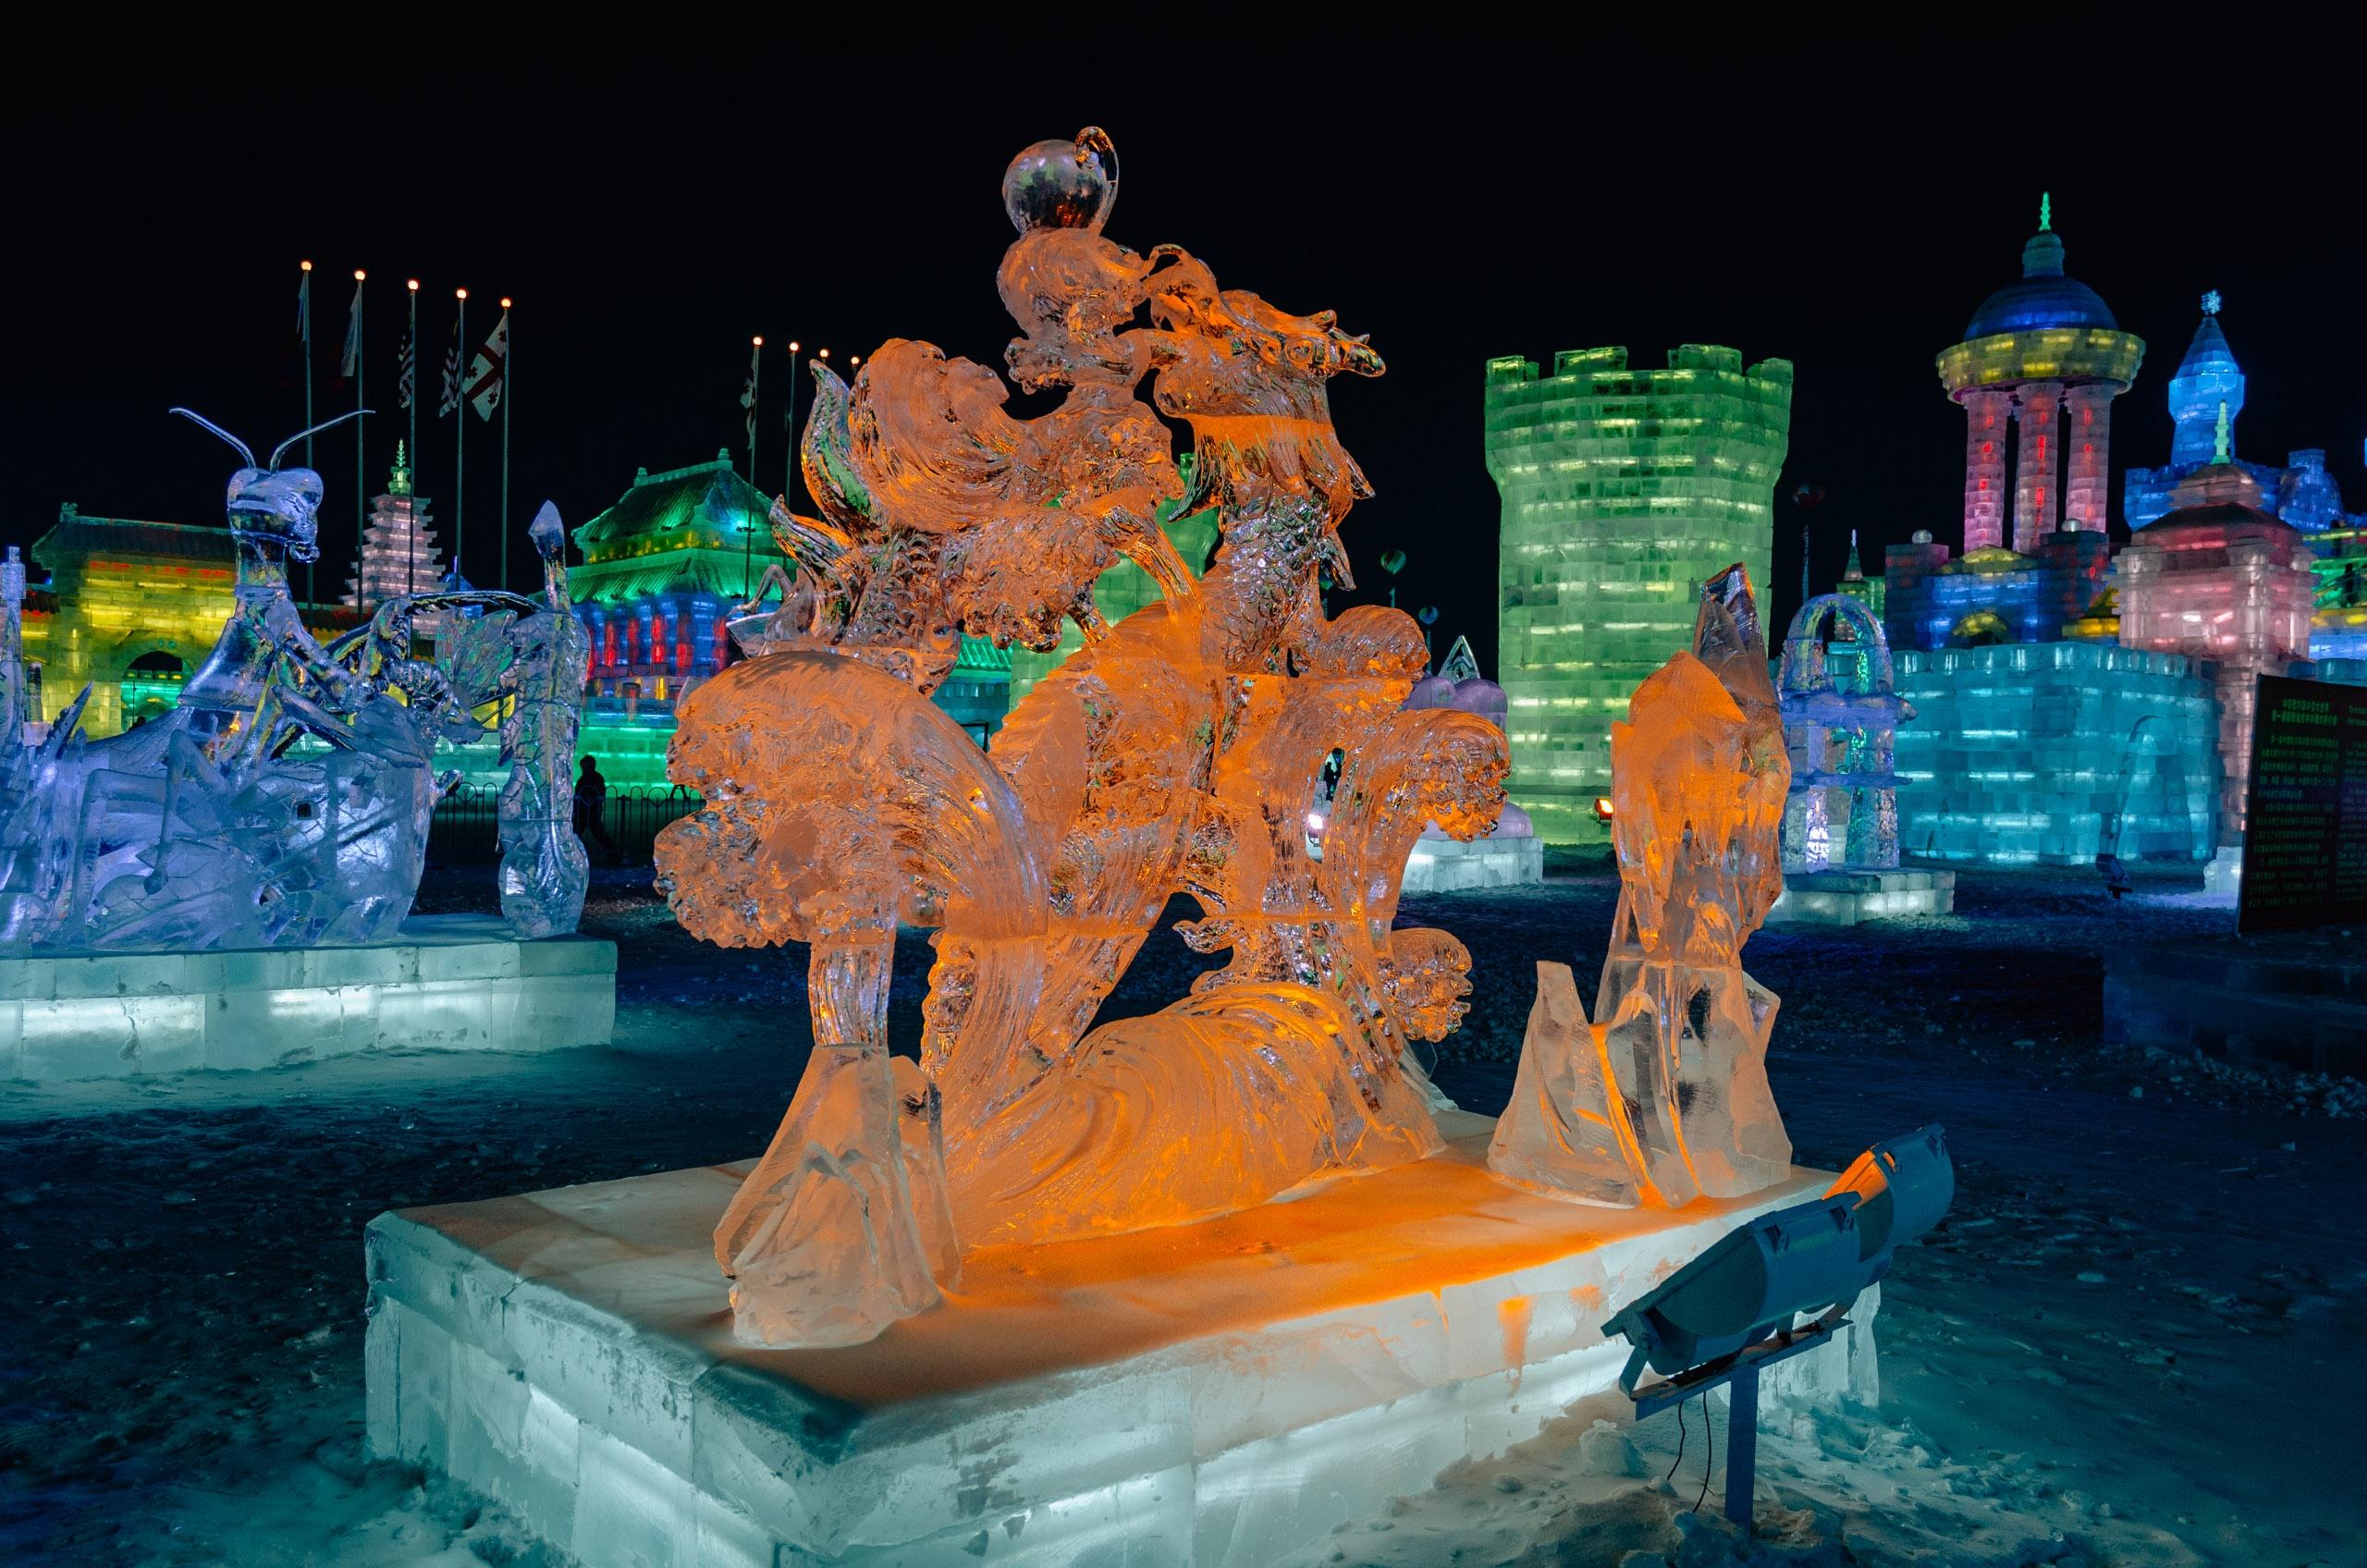 Harbin China Ice Festival - 2012-0108-DSC_2072_86463